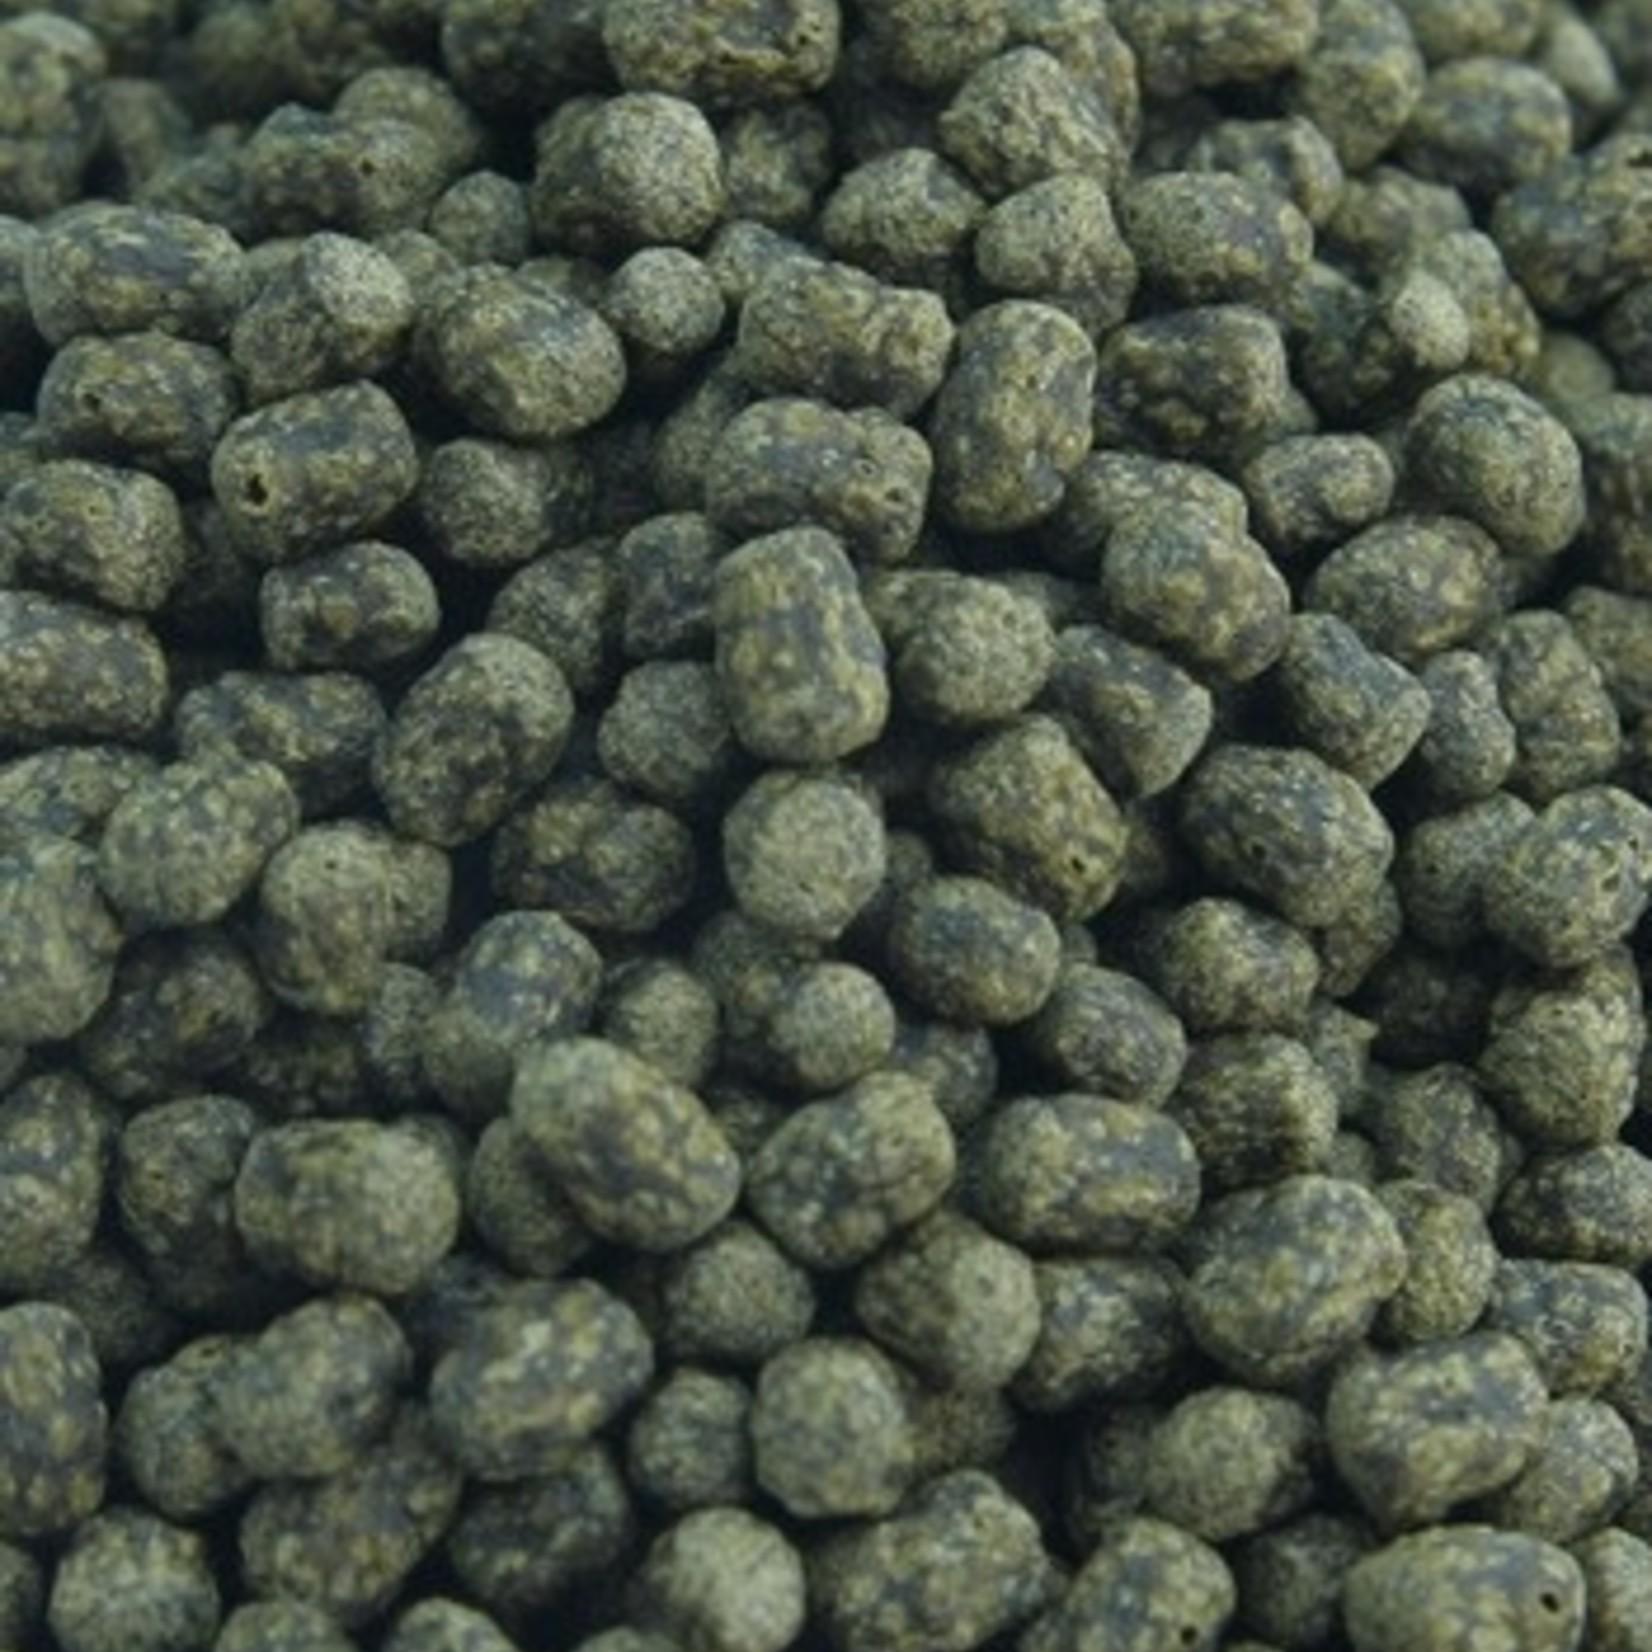 Ocean Nutrition Adult Turtle Pellets